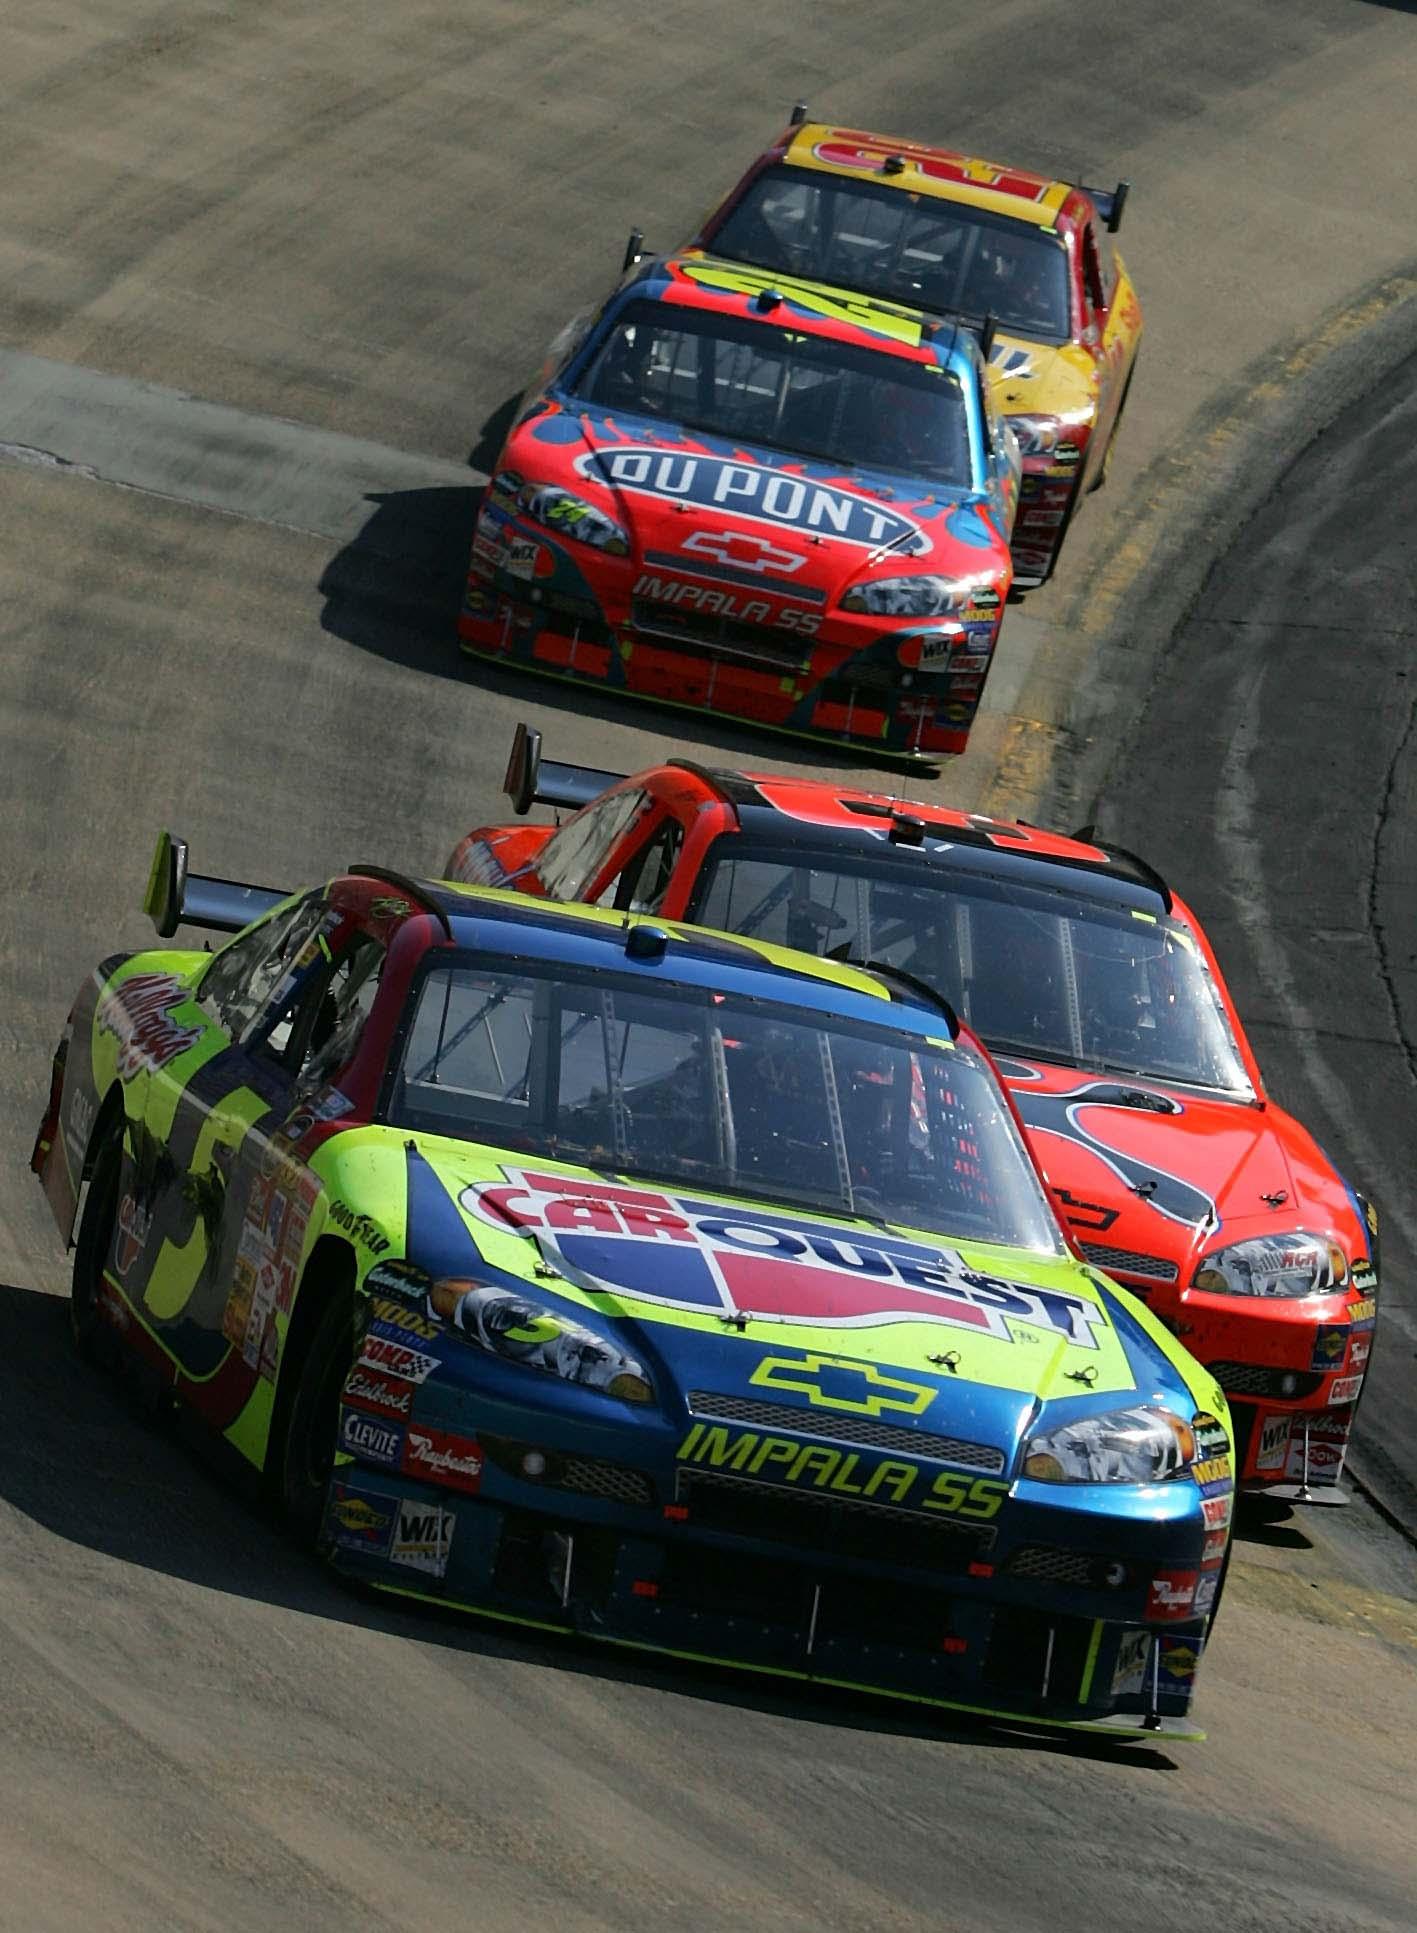 Kyle Busch, Jeff Burton, Jeff Gordon and Kevin Harvick - First COT race - Bristol Motor Speedway - NASCAR